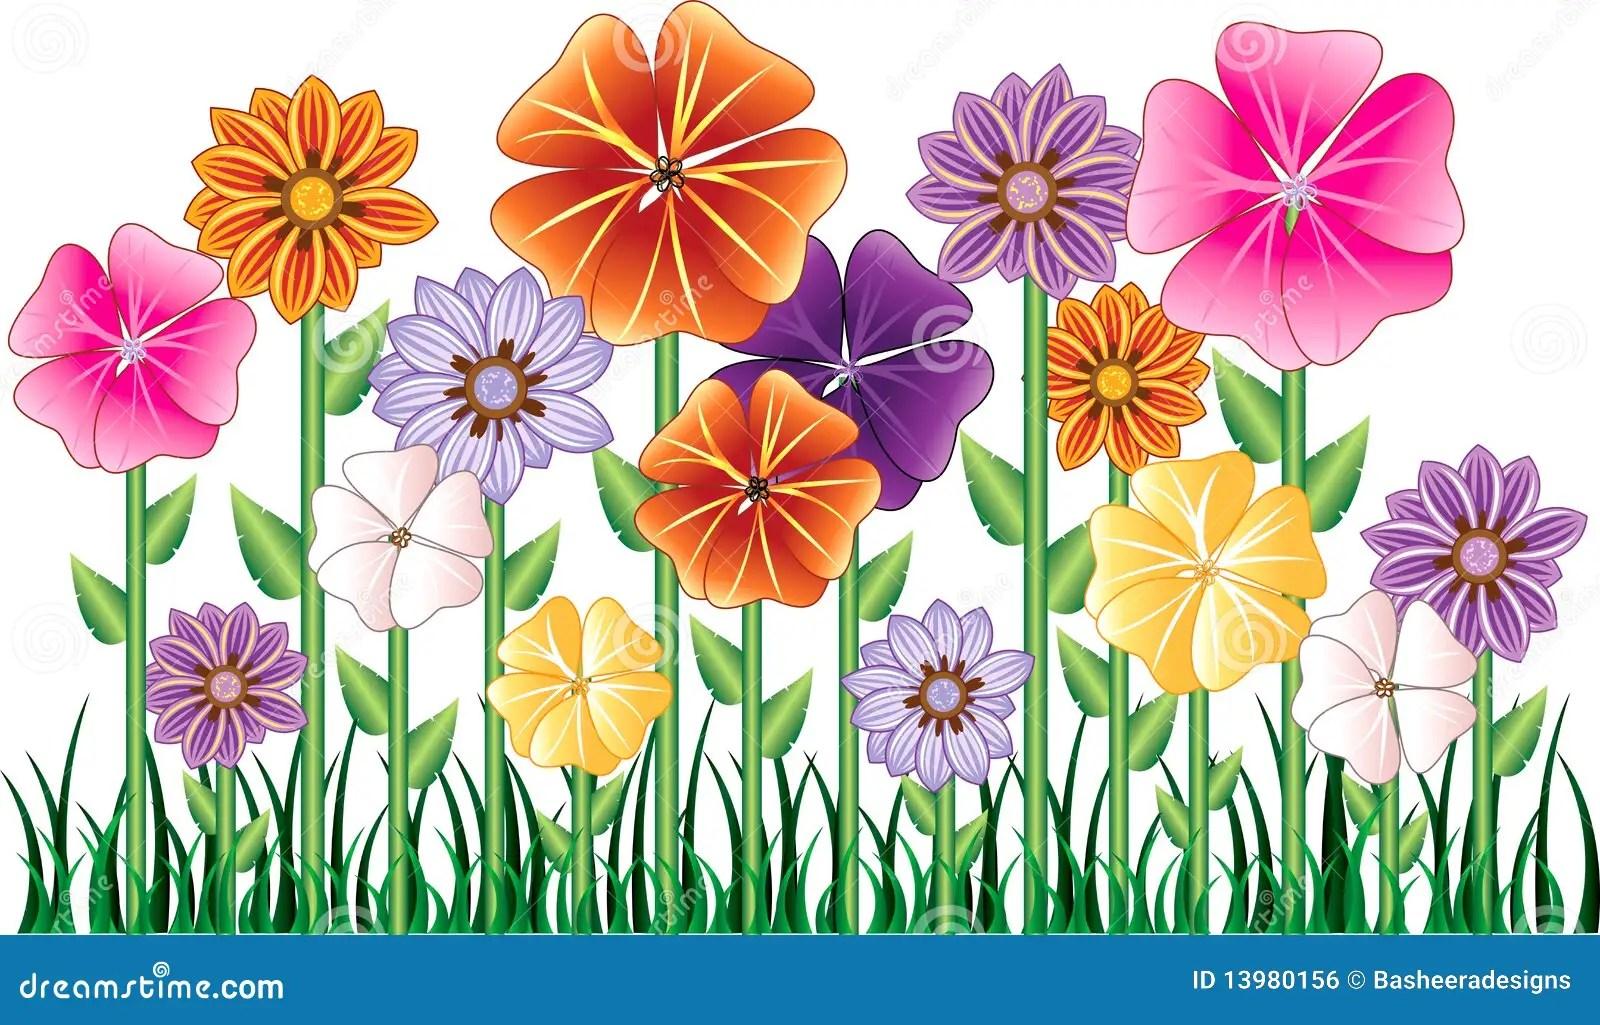 hight resolution of flower garden